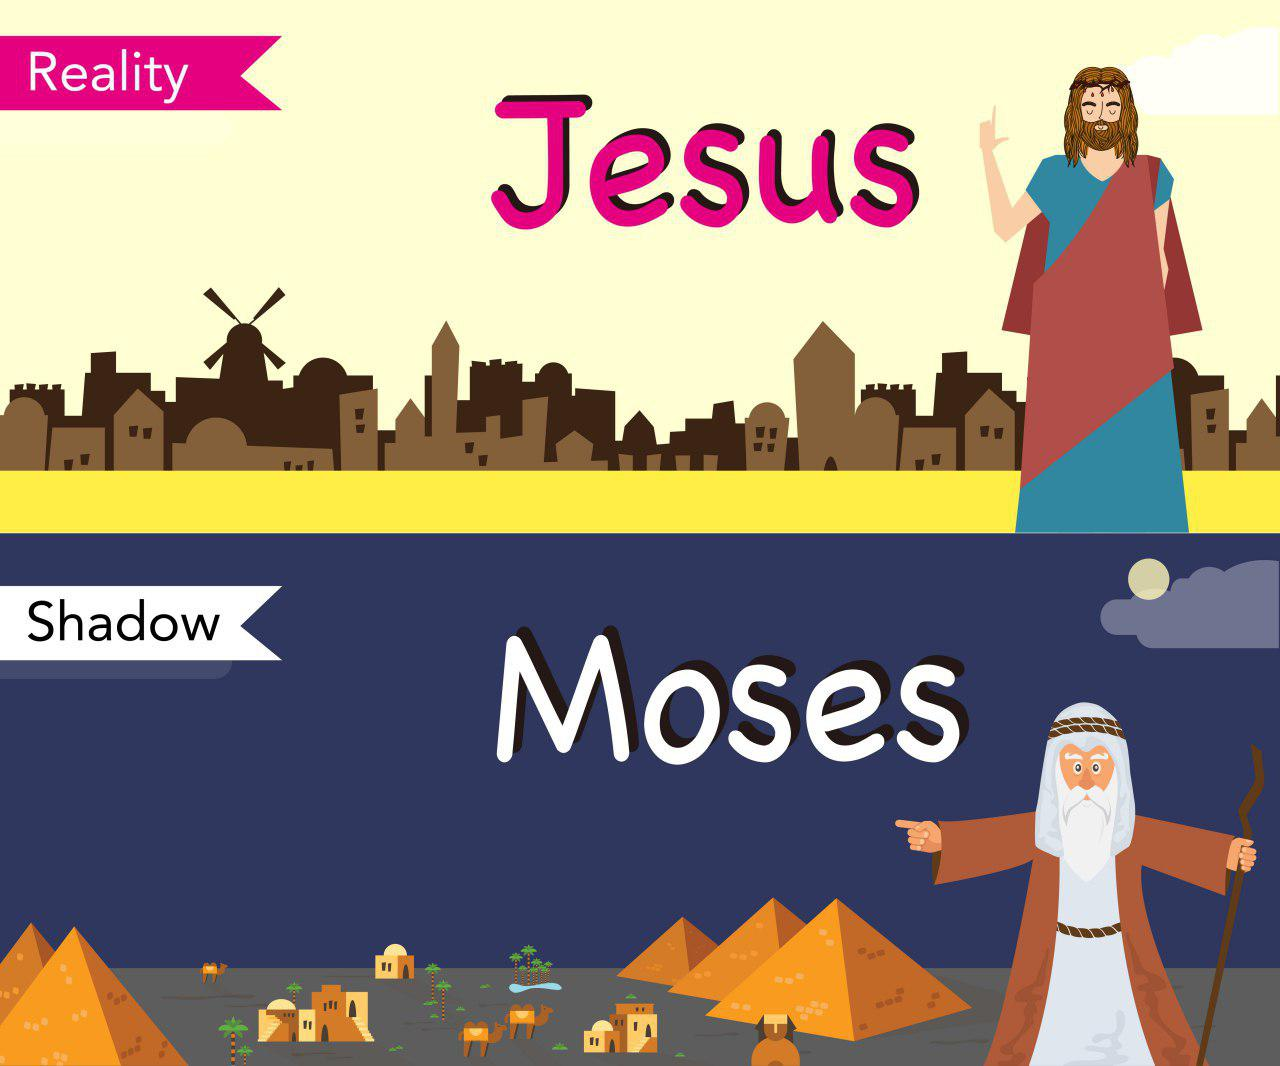 wmscog, World Mission Society Church of God